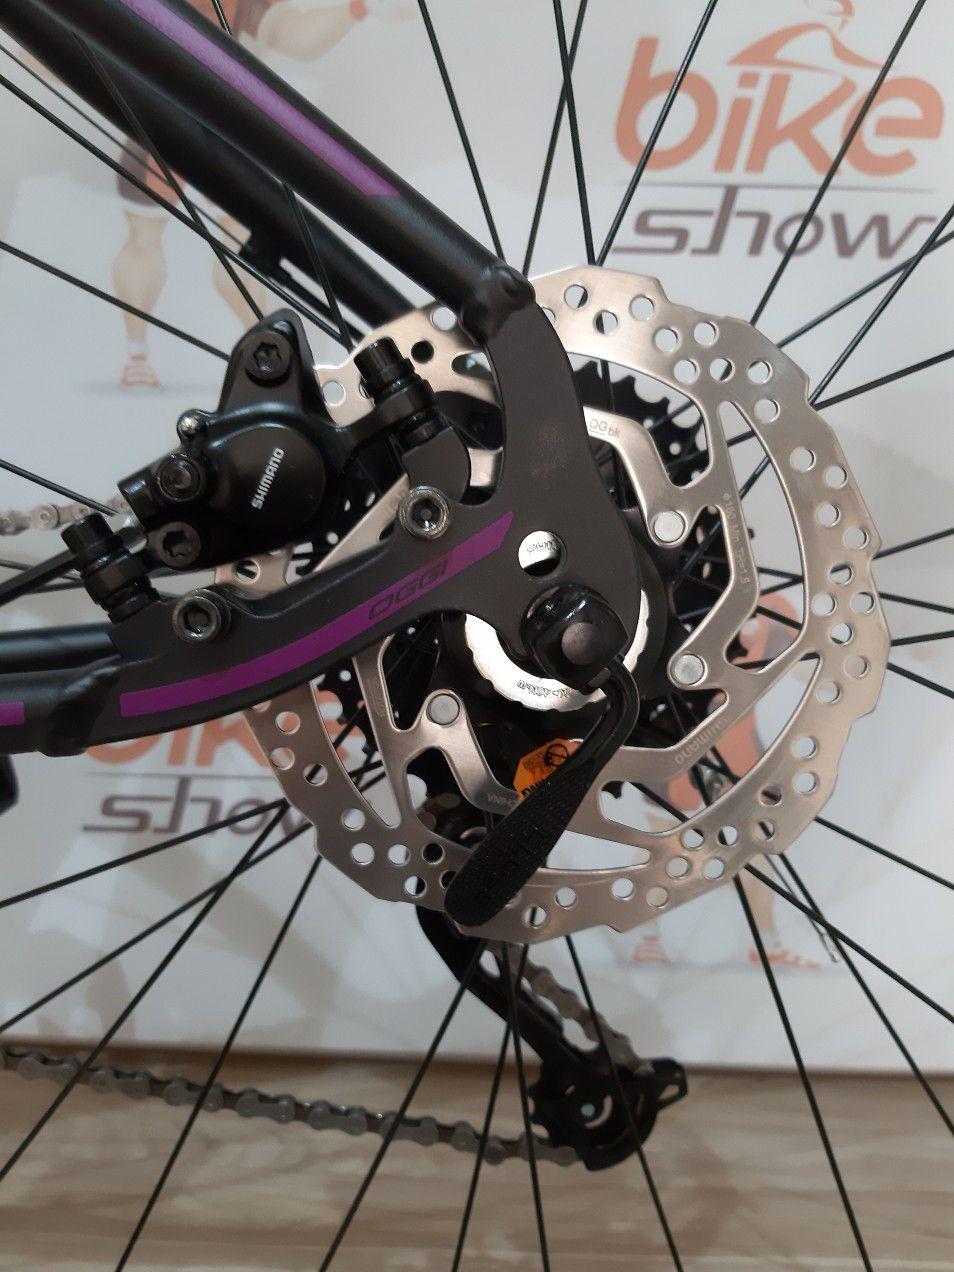 Bicicleta OGGI Float 5.0 - 27V Shimano Altus - Freio hidráulico - Preto/Uva